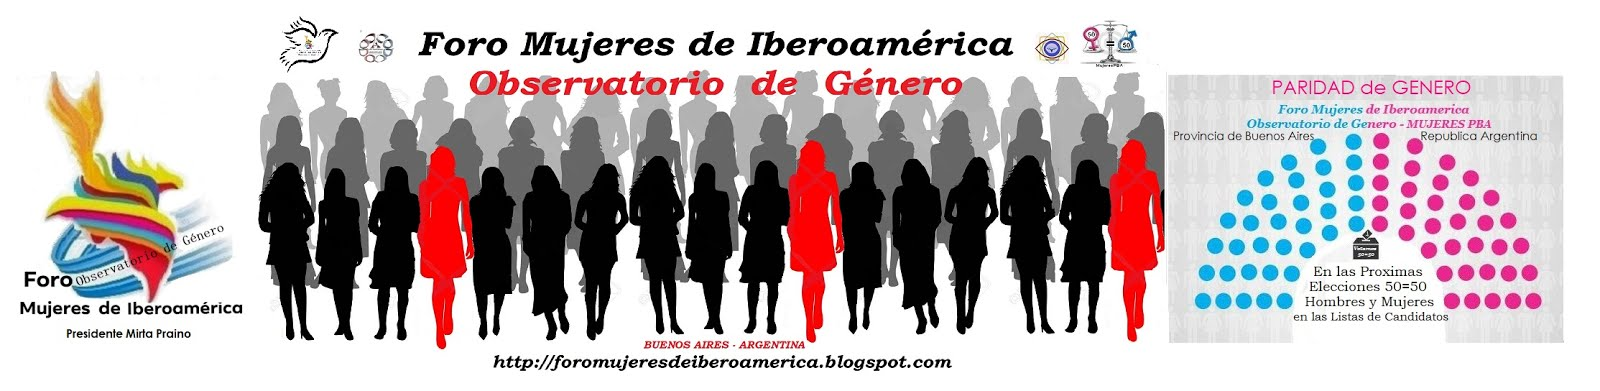 Foro Mujeres de Iberoamerica -                                 - Observatorio de Genero